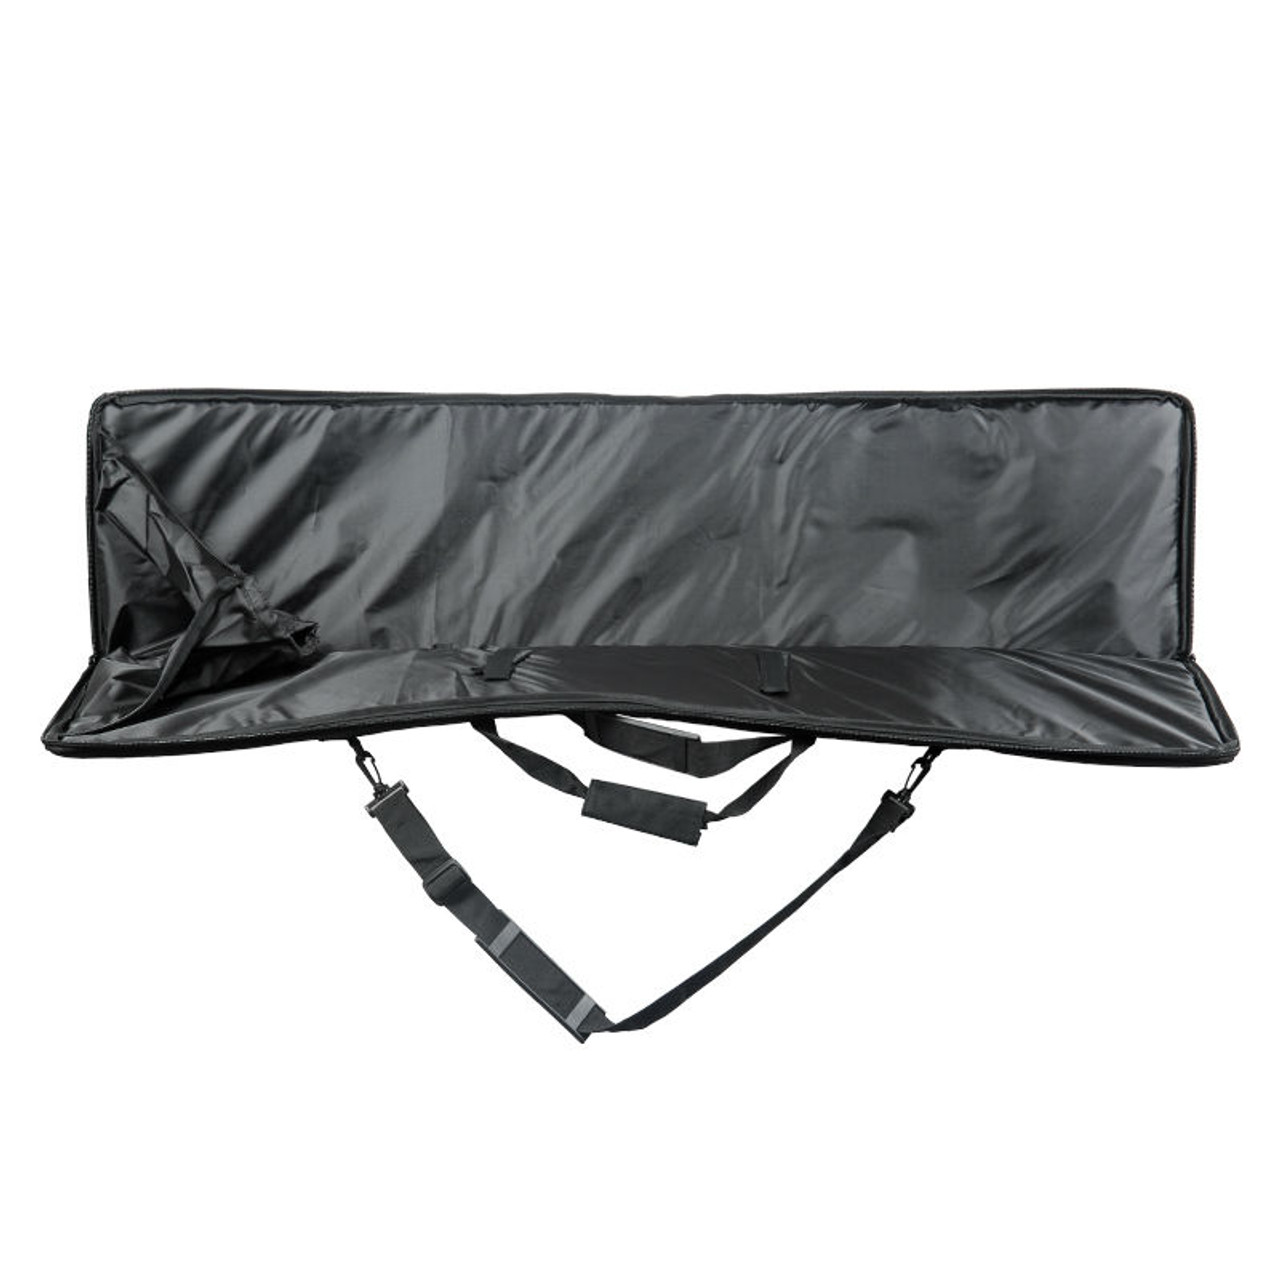 "Lancer Tactical - 47"" PVC Gun Bag (Black)"